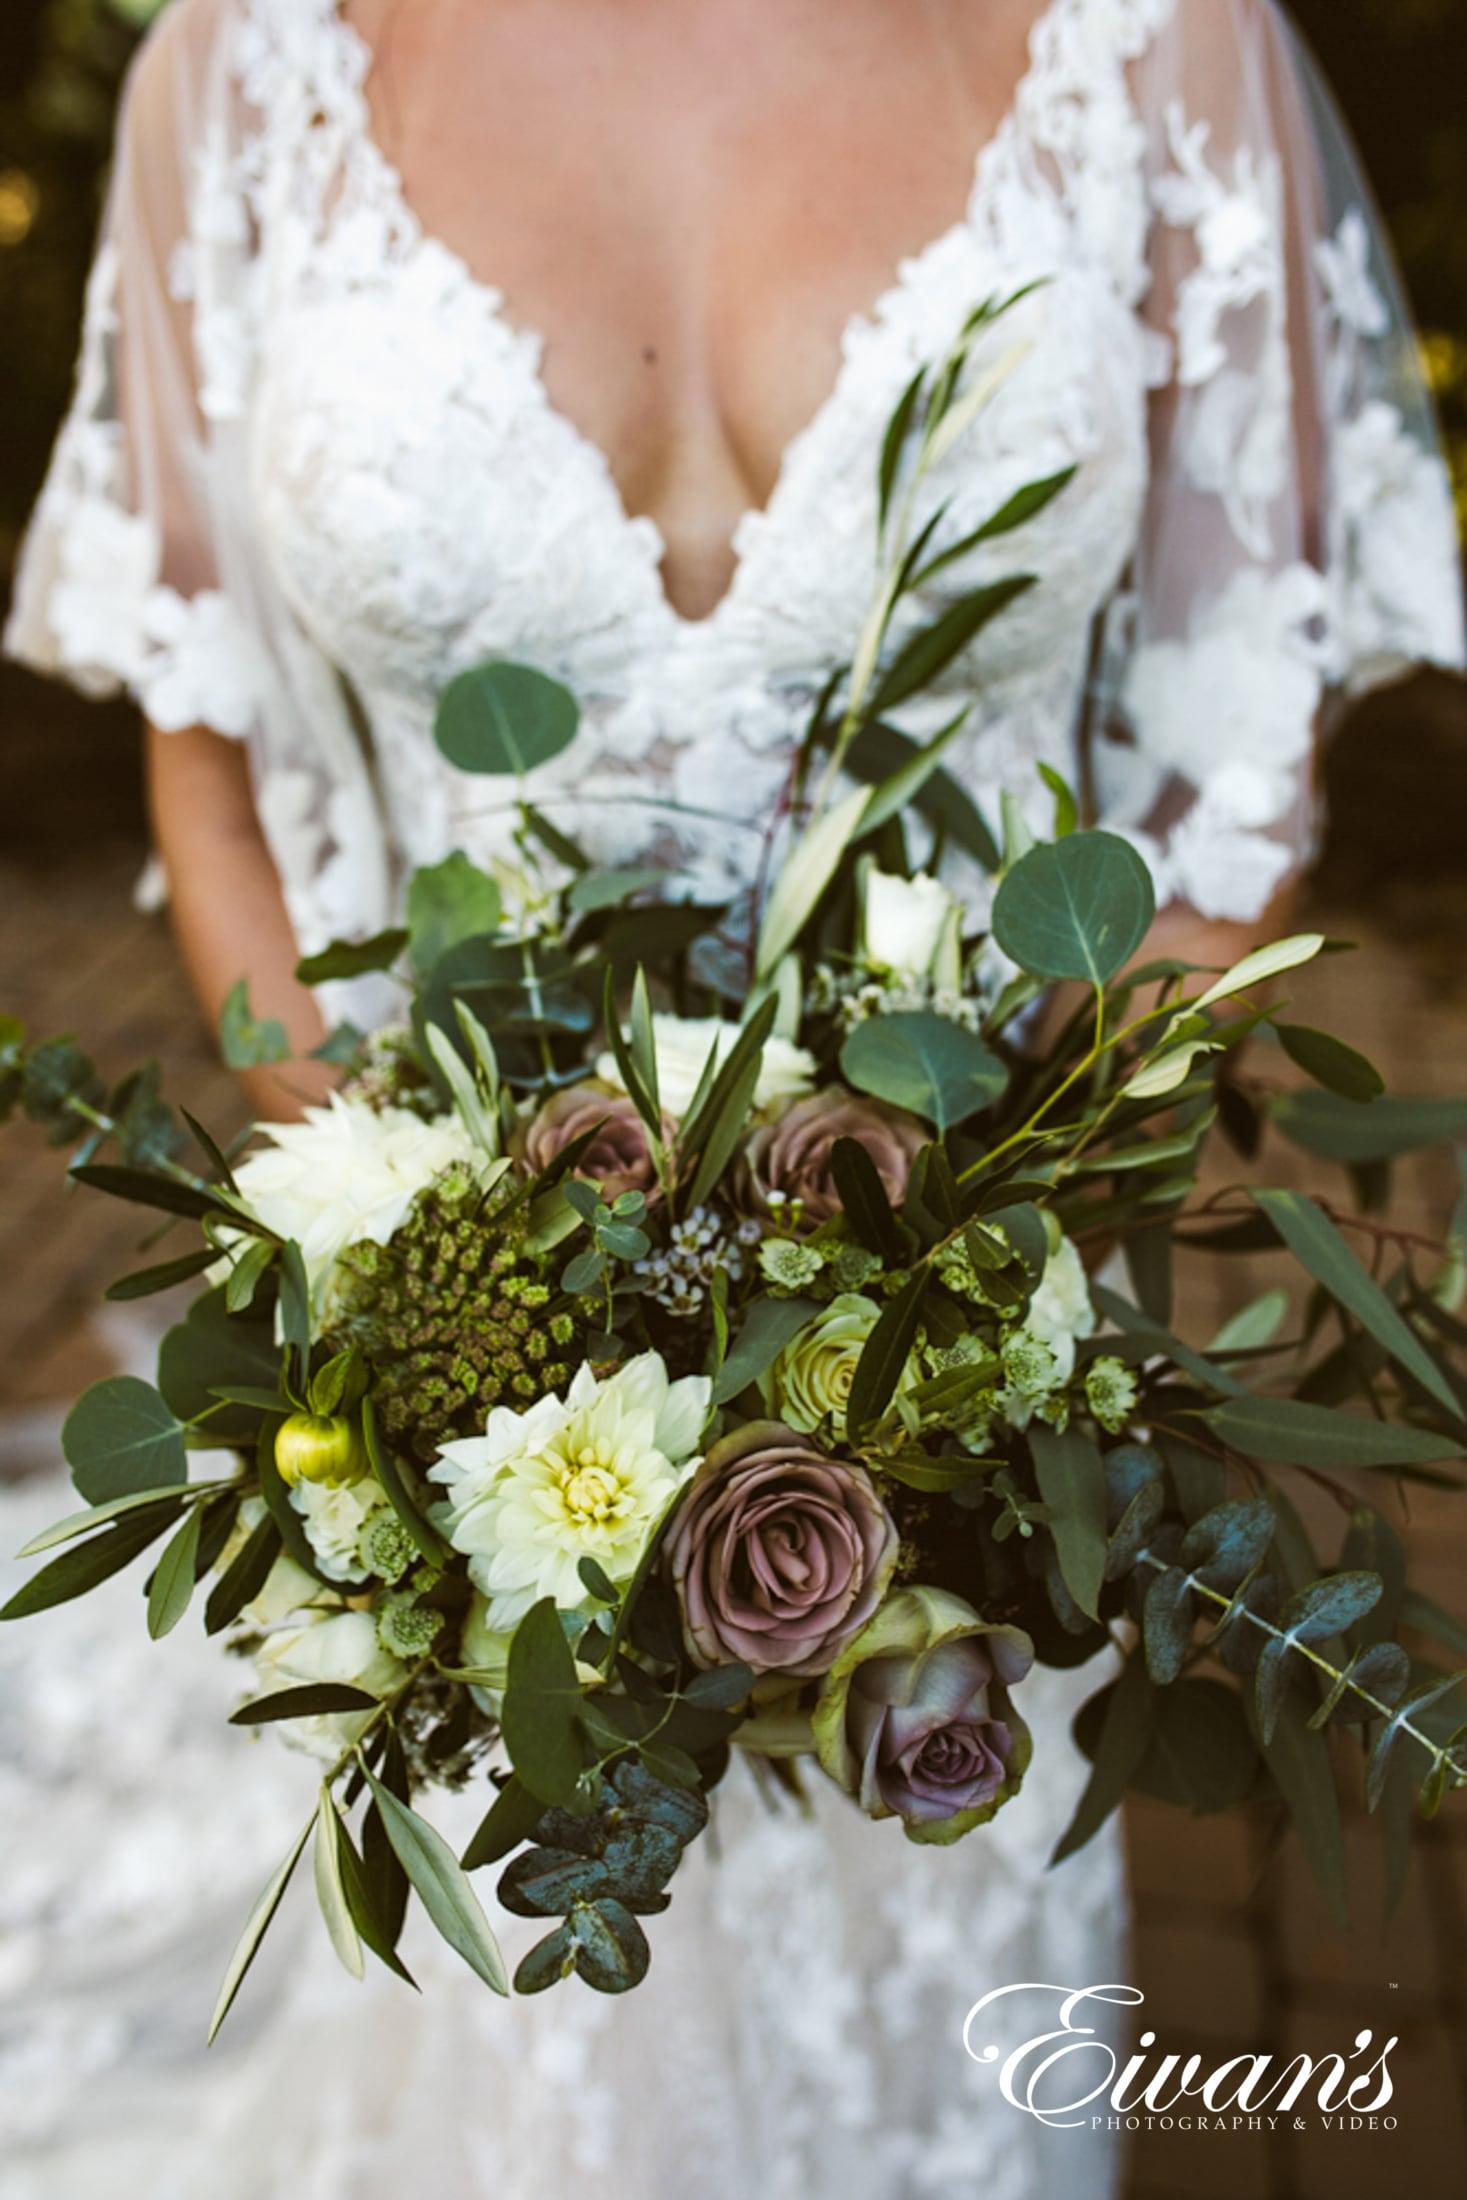 image of a bridal bouquet